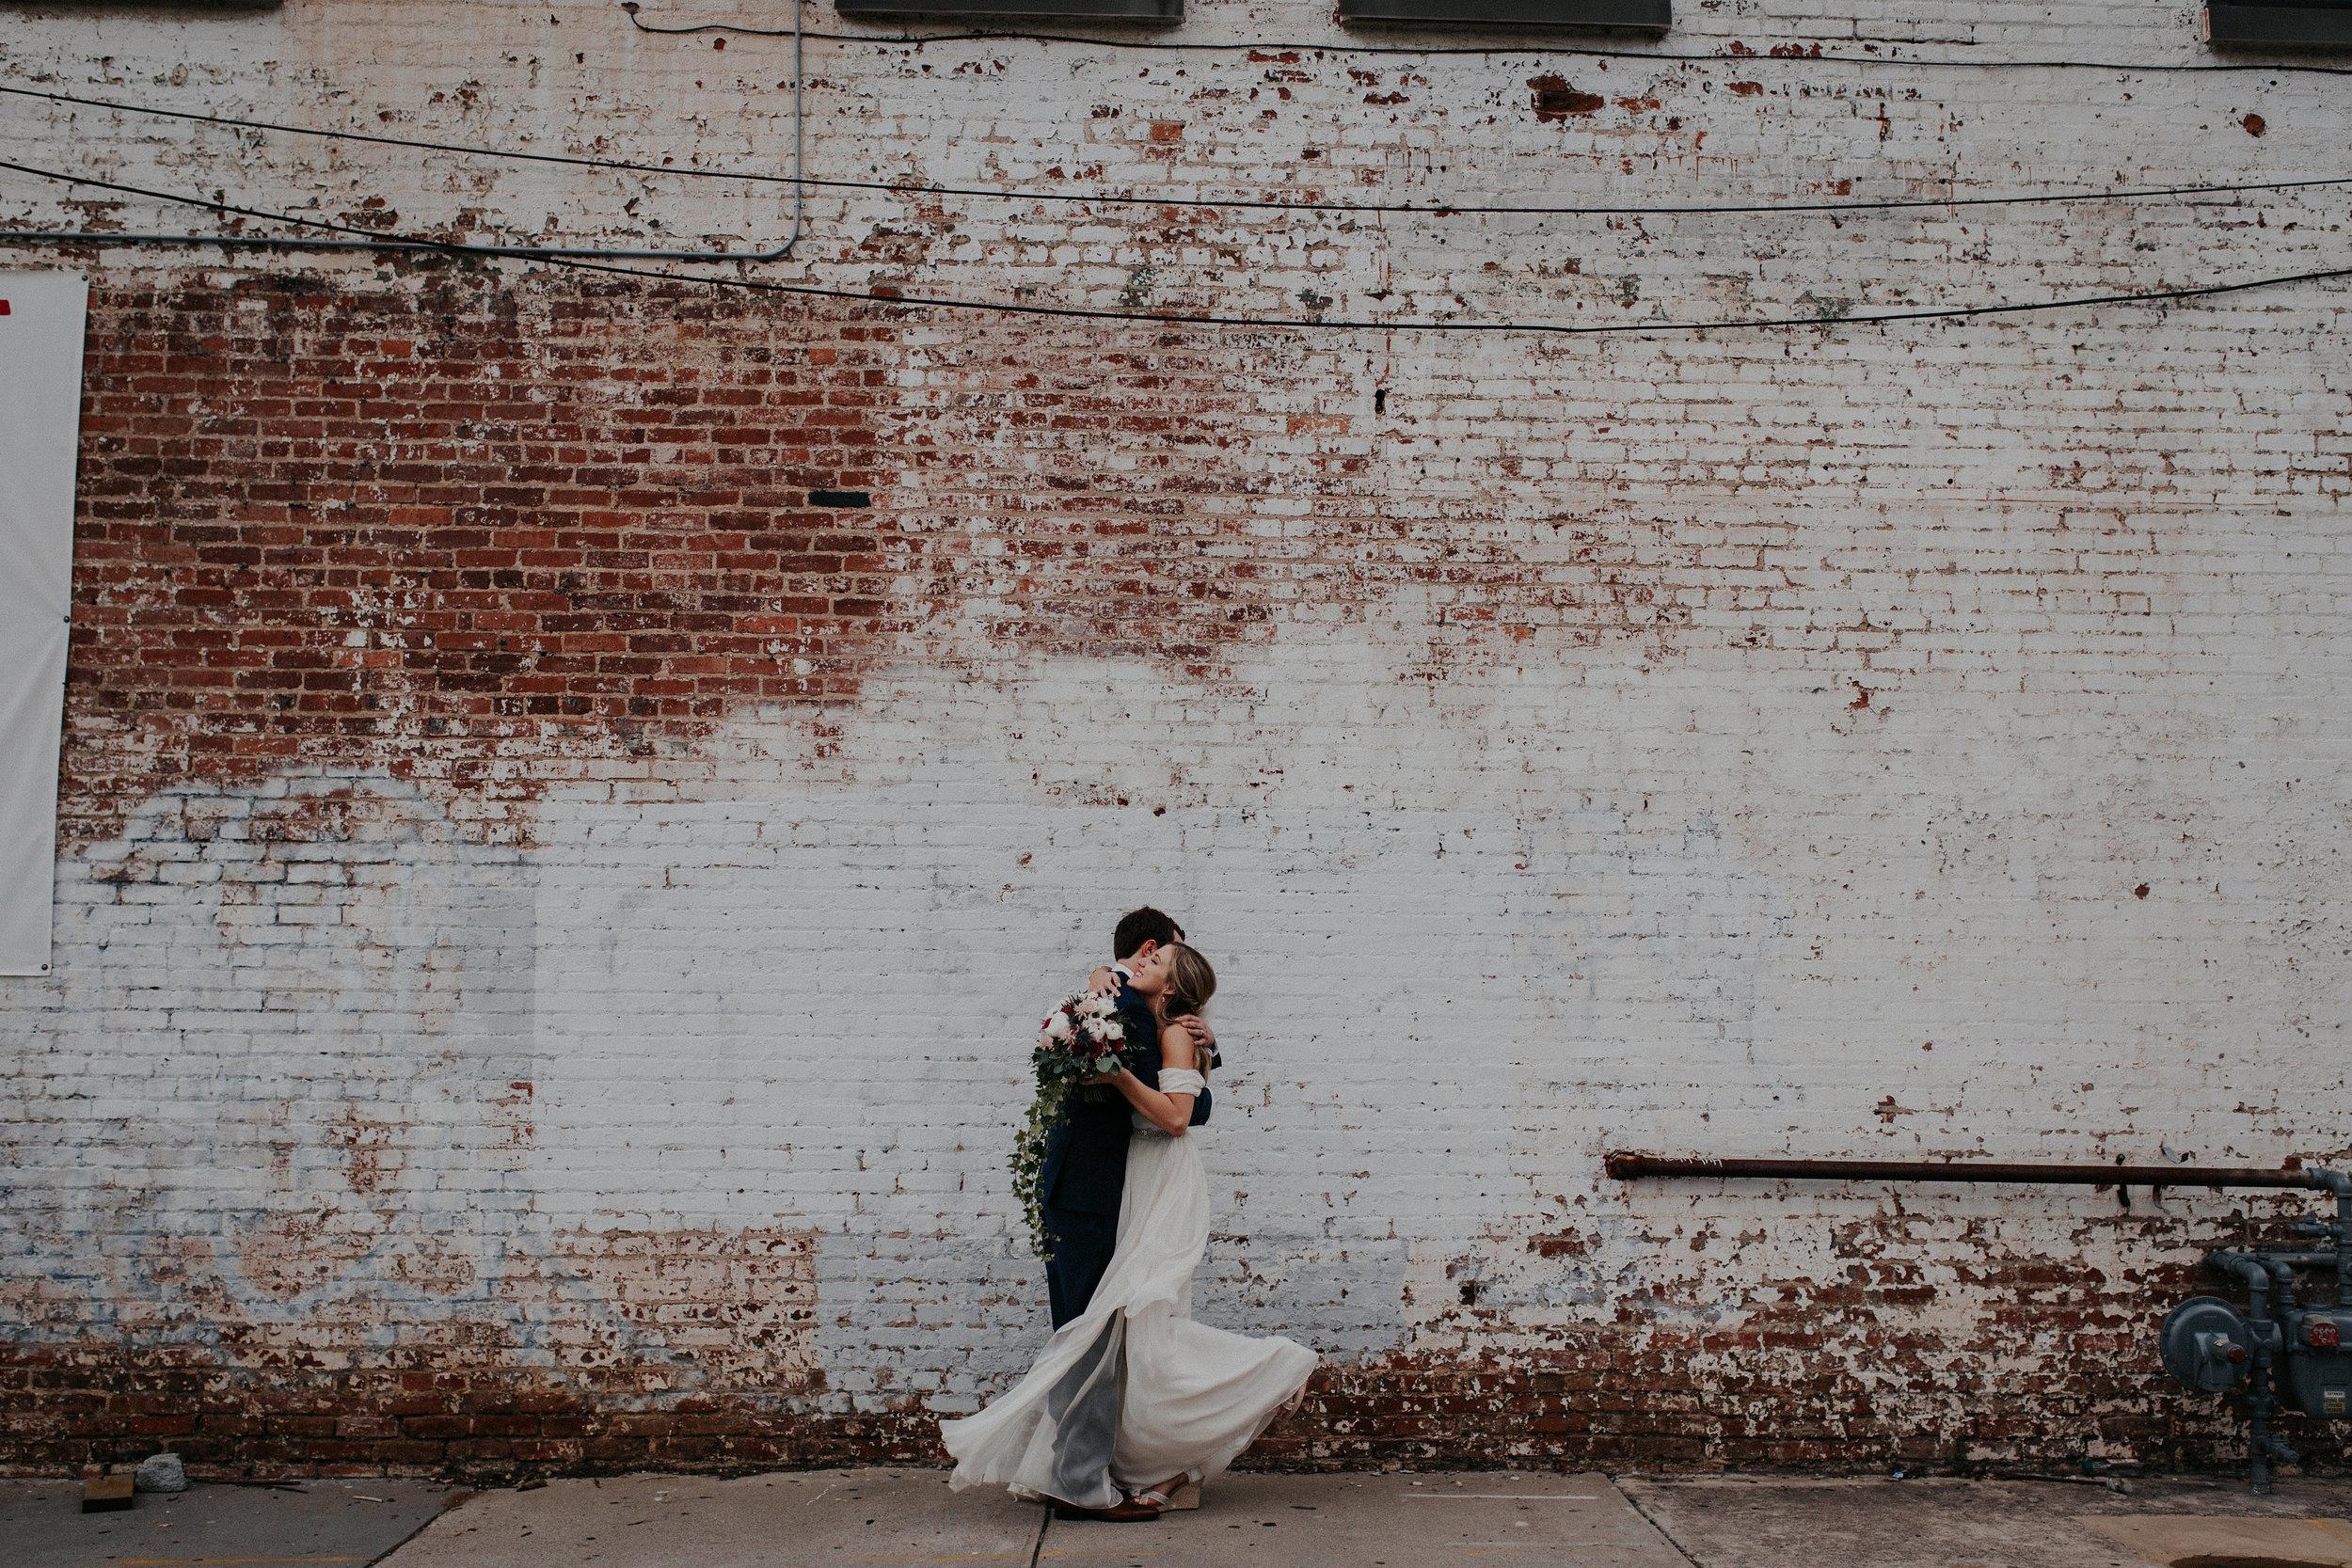 ALLD_royster_wedding-684.JPG